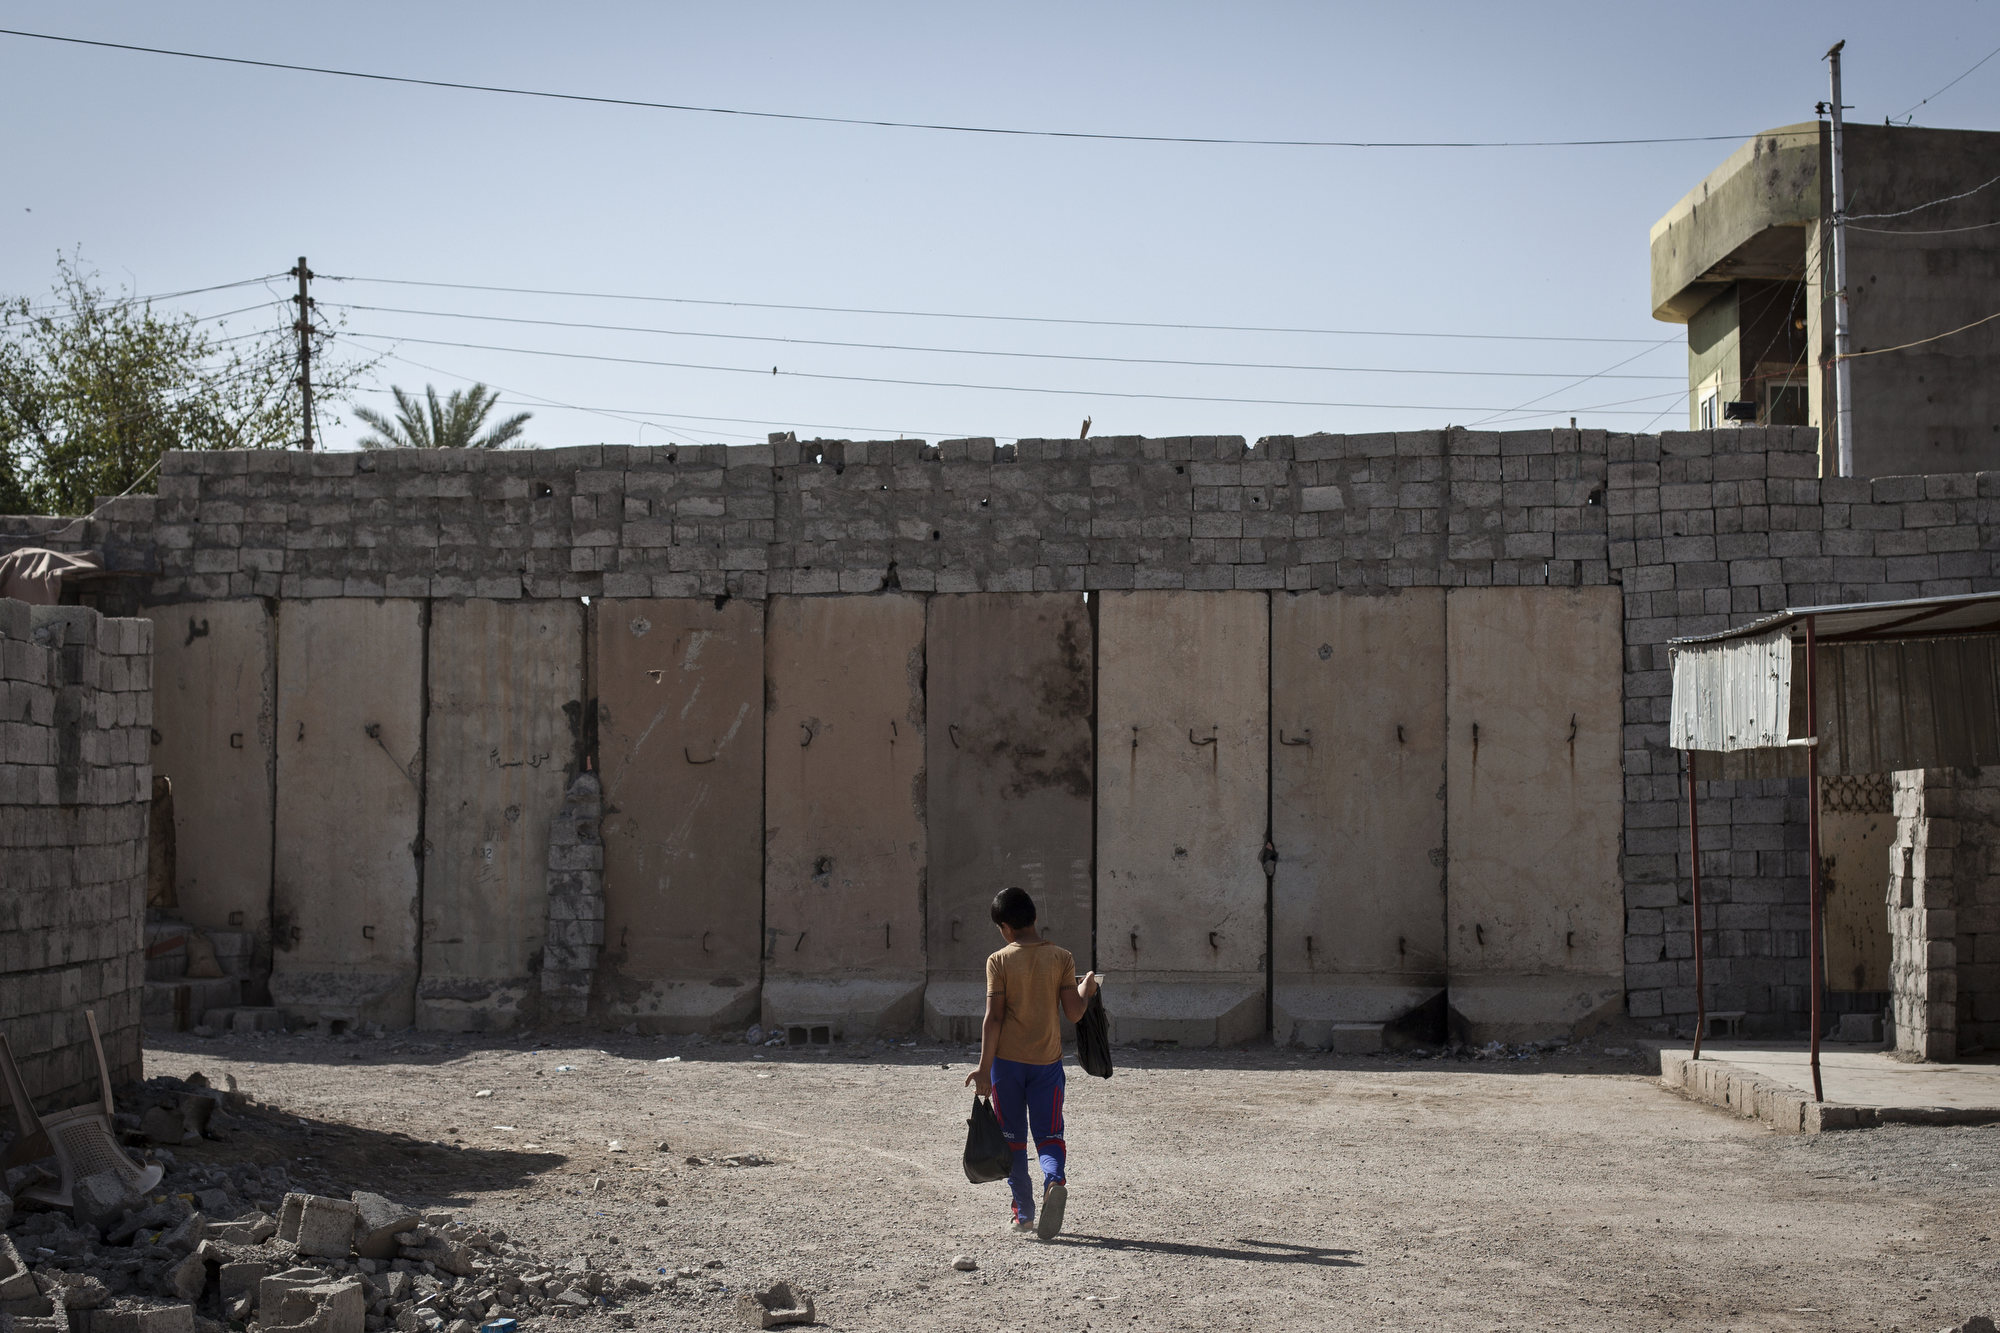 A wall across a main street separates Kurdish and Turkman districts.